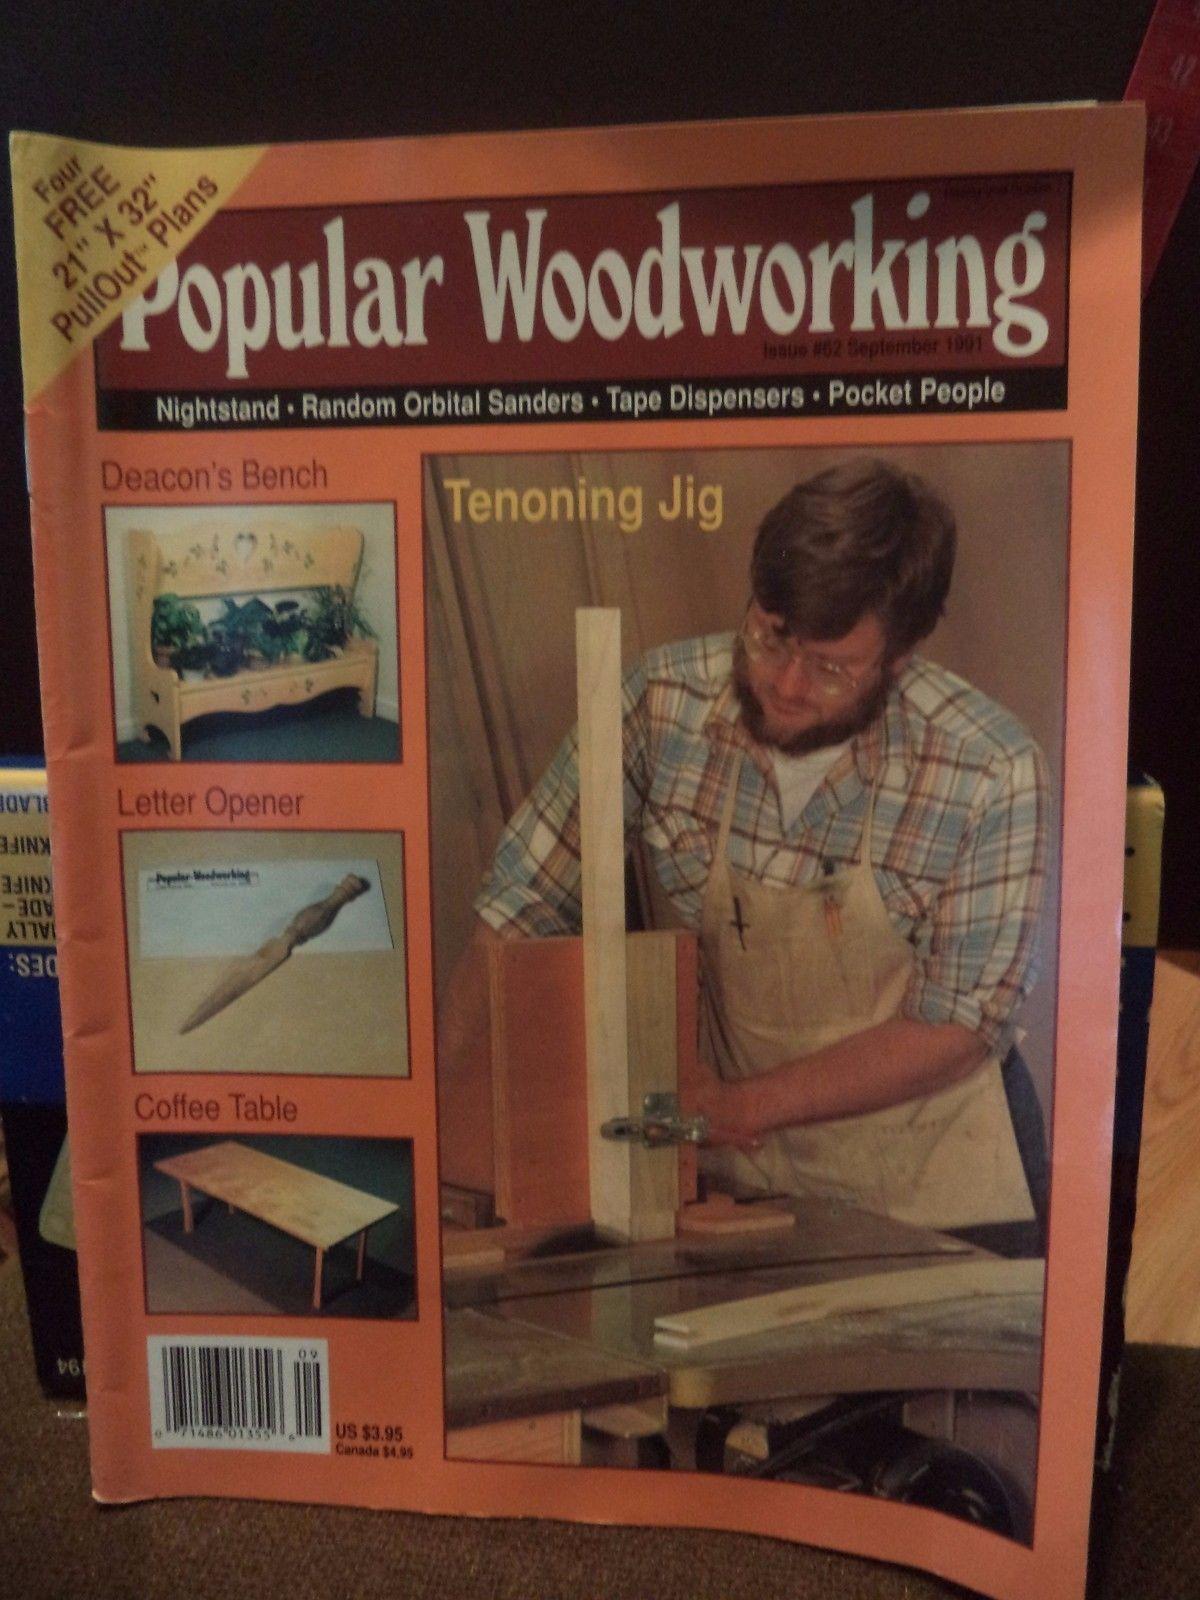 Popular Woodworking Nightstand Tape Dispenser Pocket People More